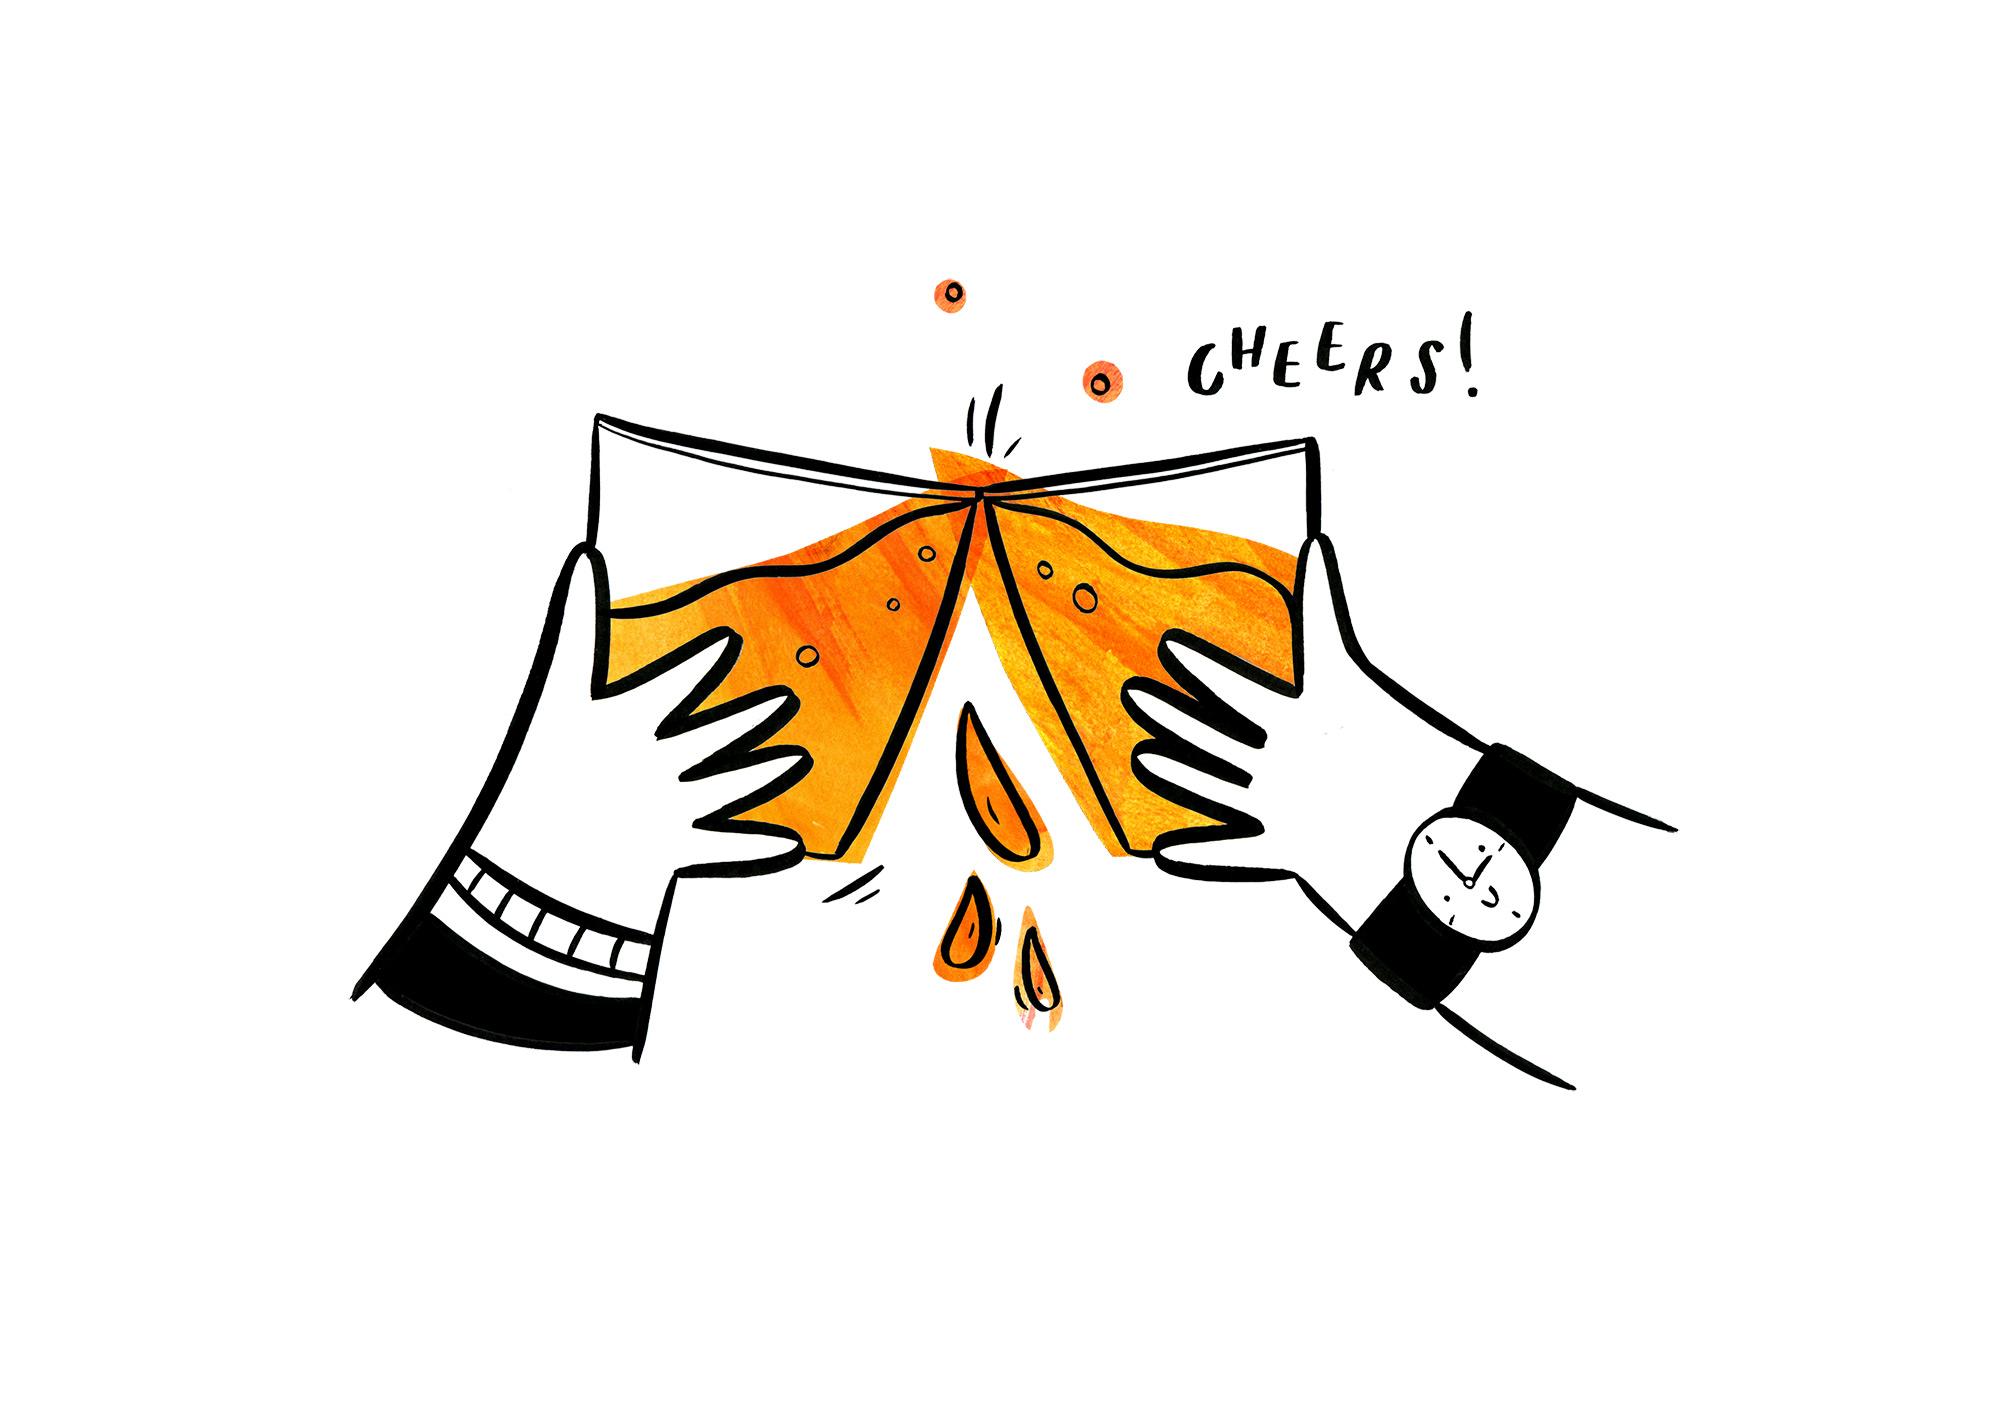 Circus-Illustration---Cheers.jpg